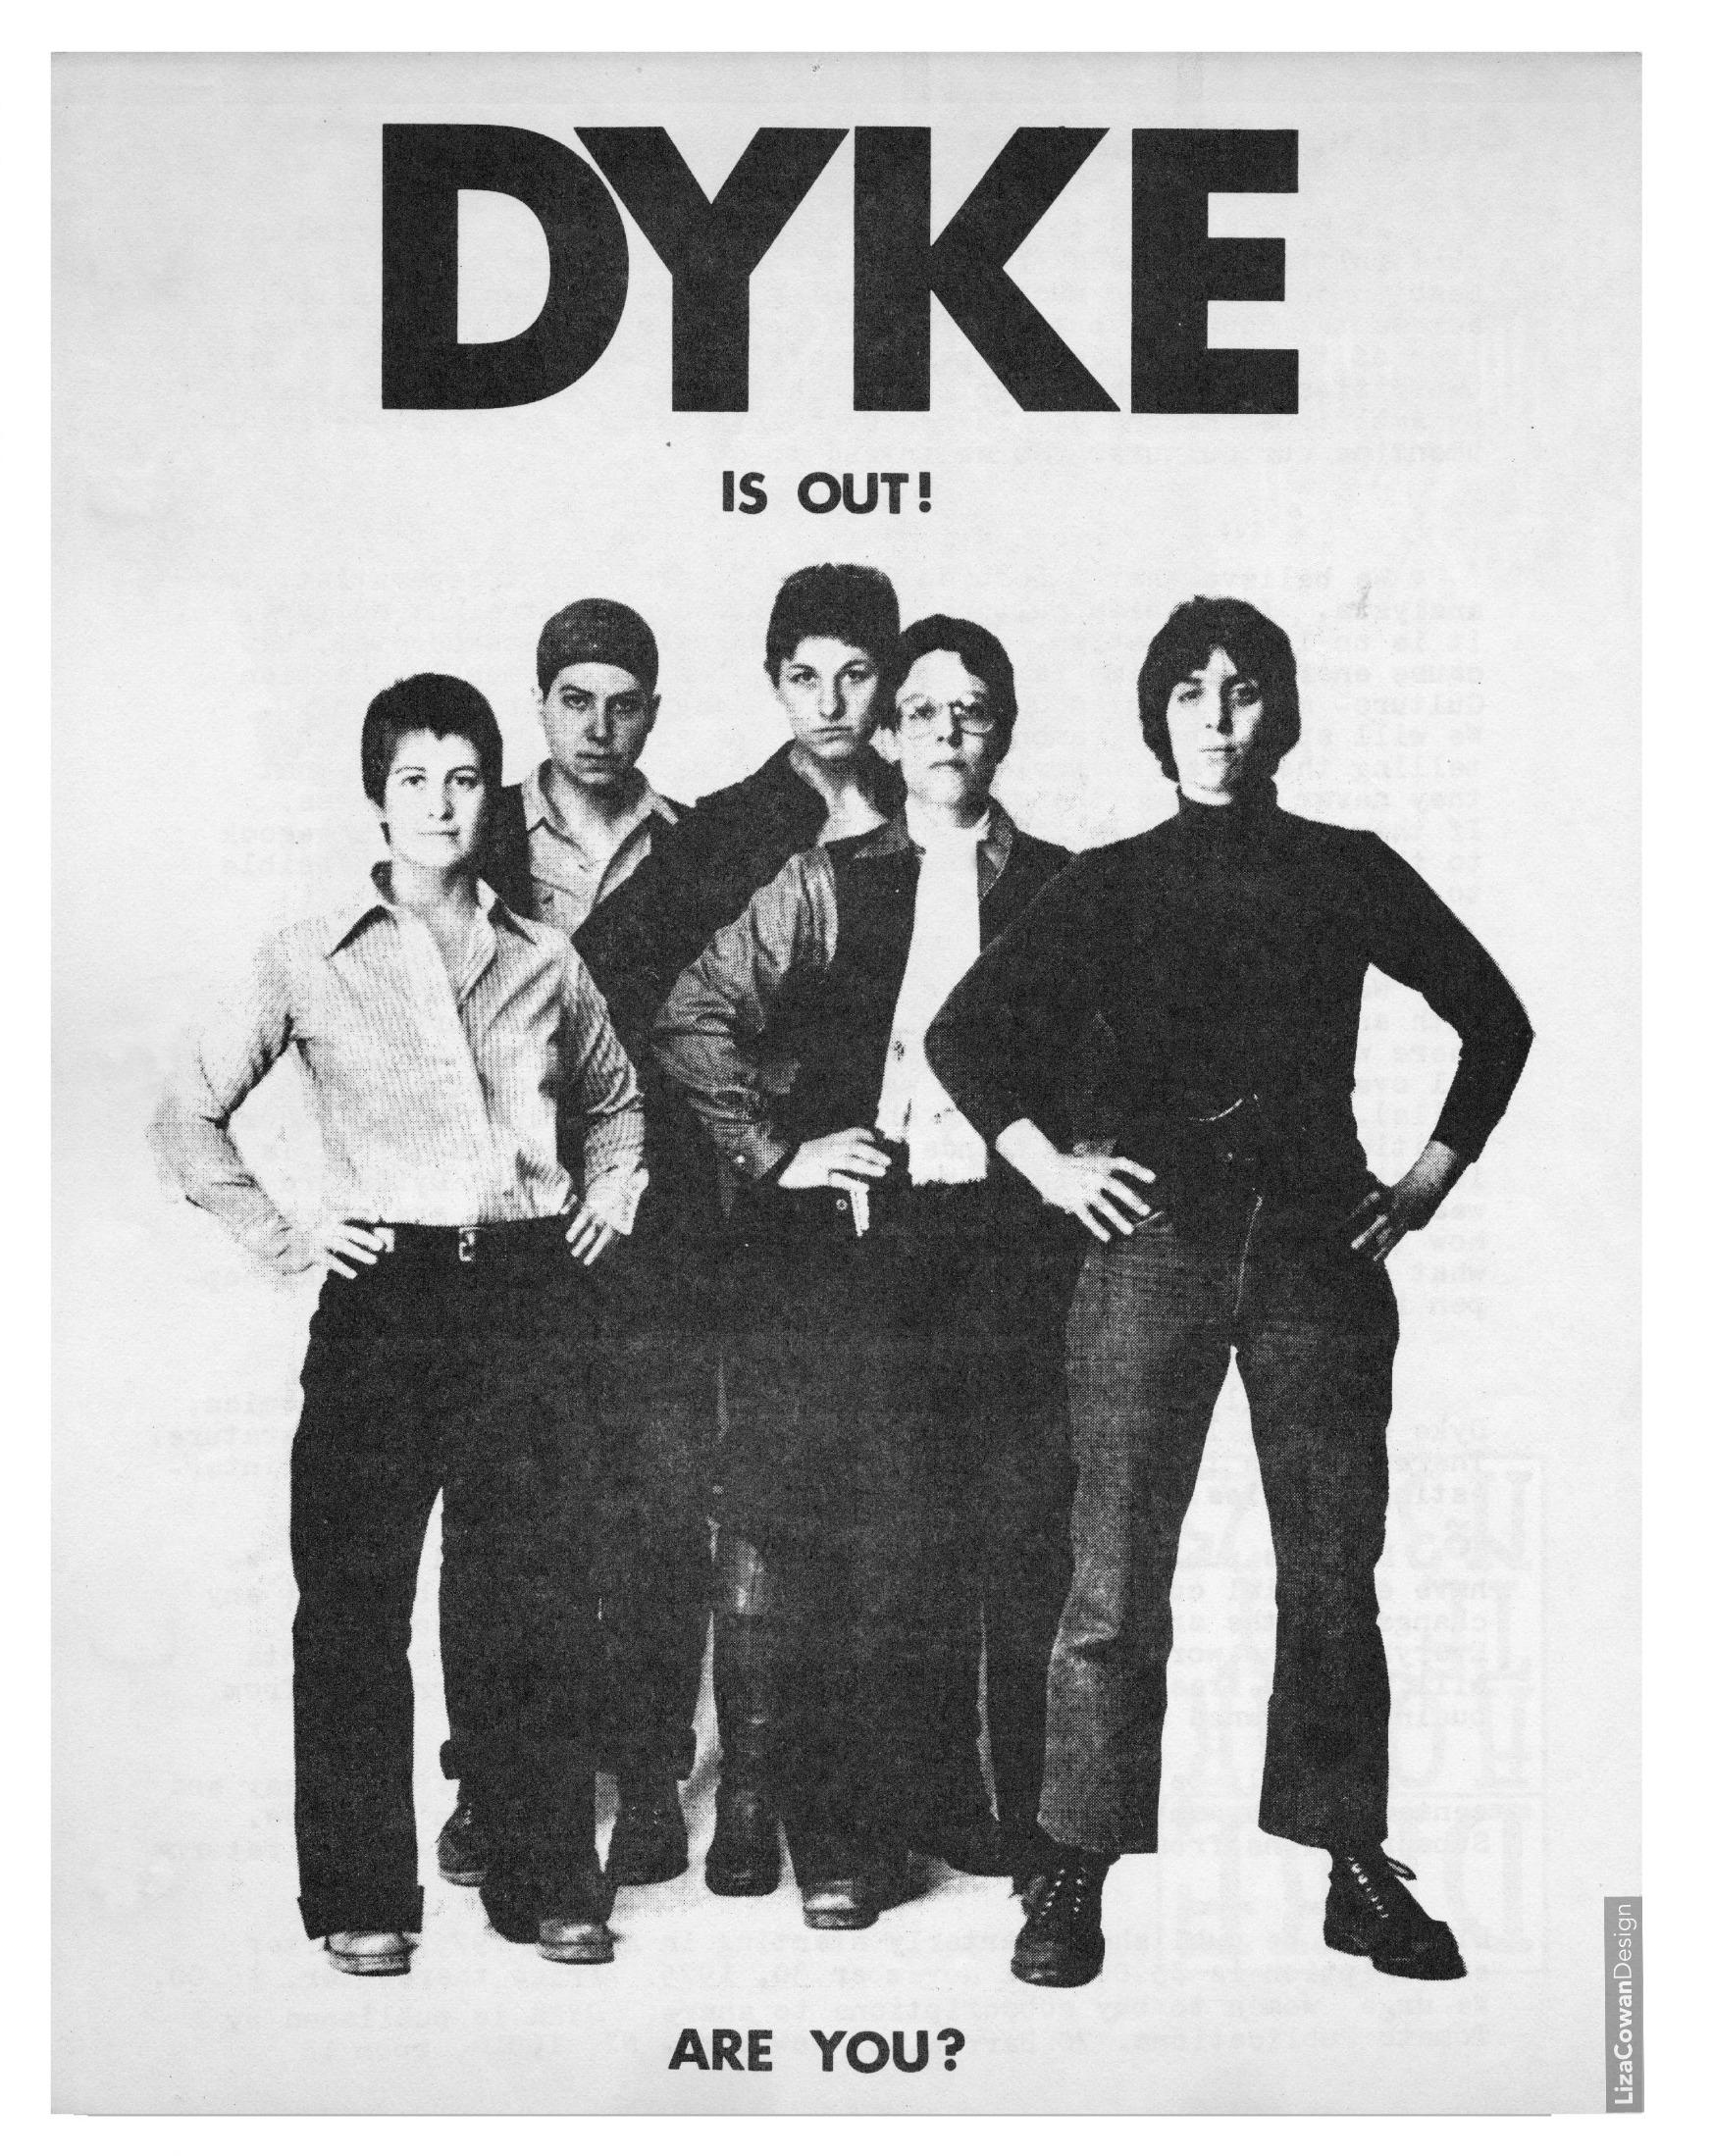 DYKE, A Quarterlyflyer, design by Liza Cowanc. 1974Courtesy Liza Cowan and Penny House